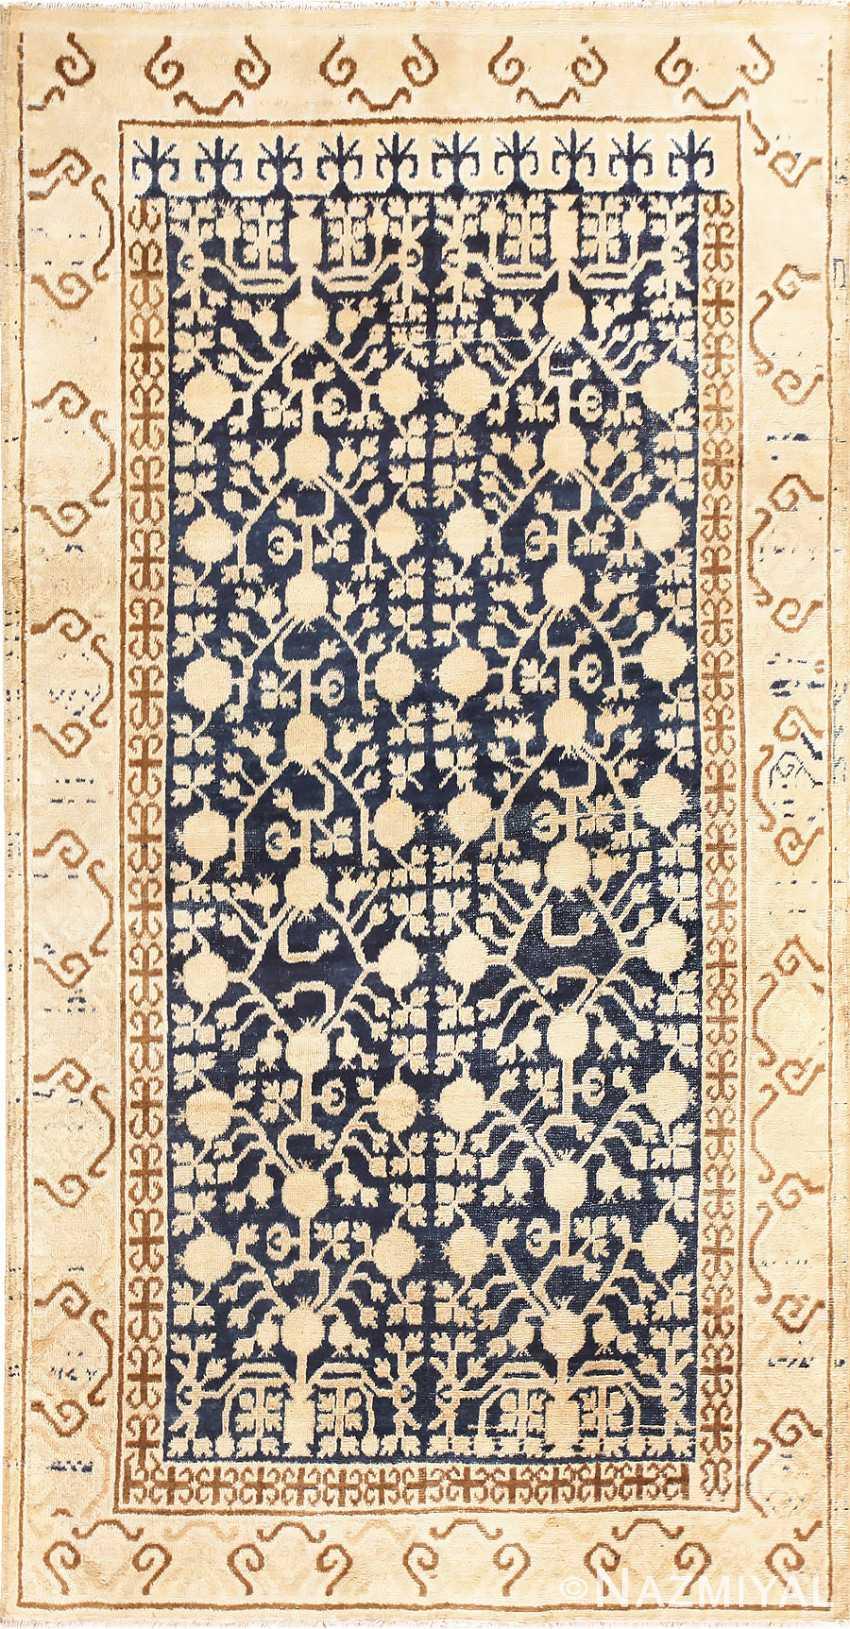 Small Pomegranate Design Antique Khotan Rug 48771 Nazmiyal